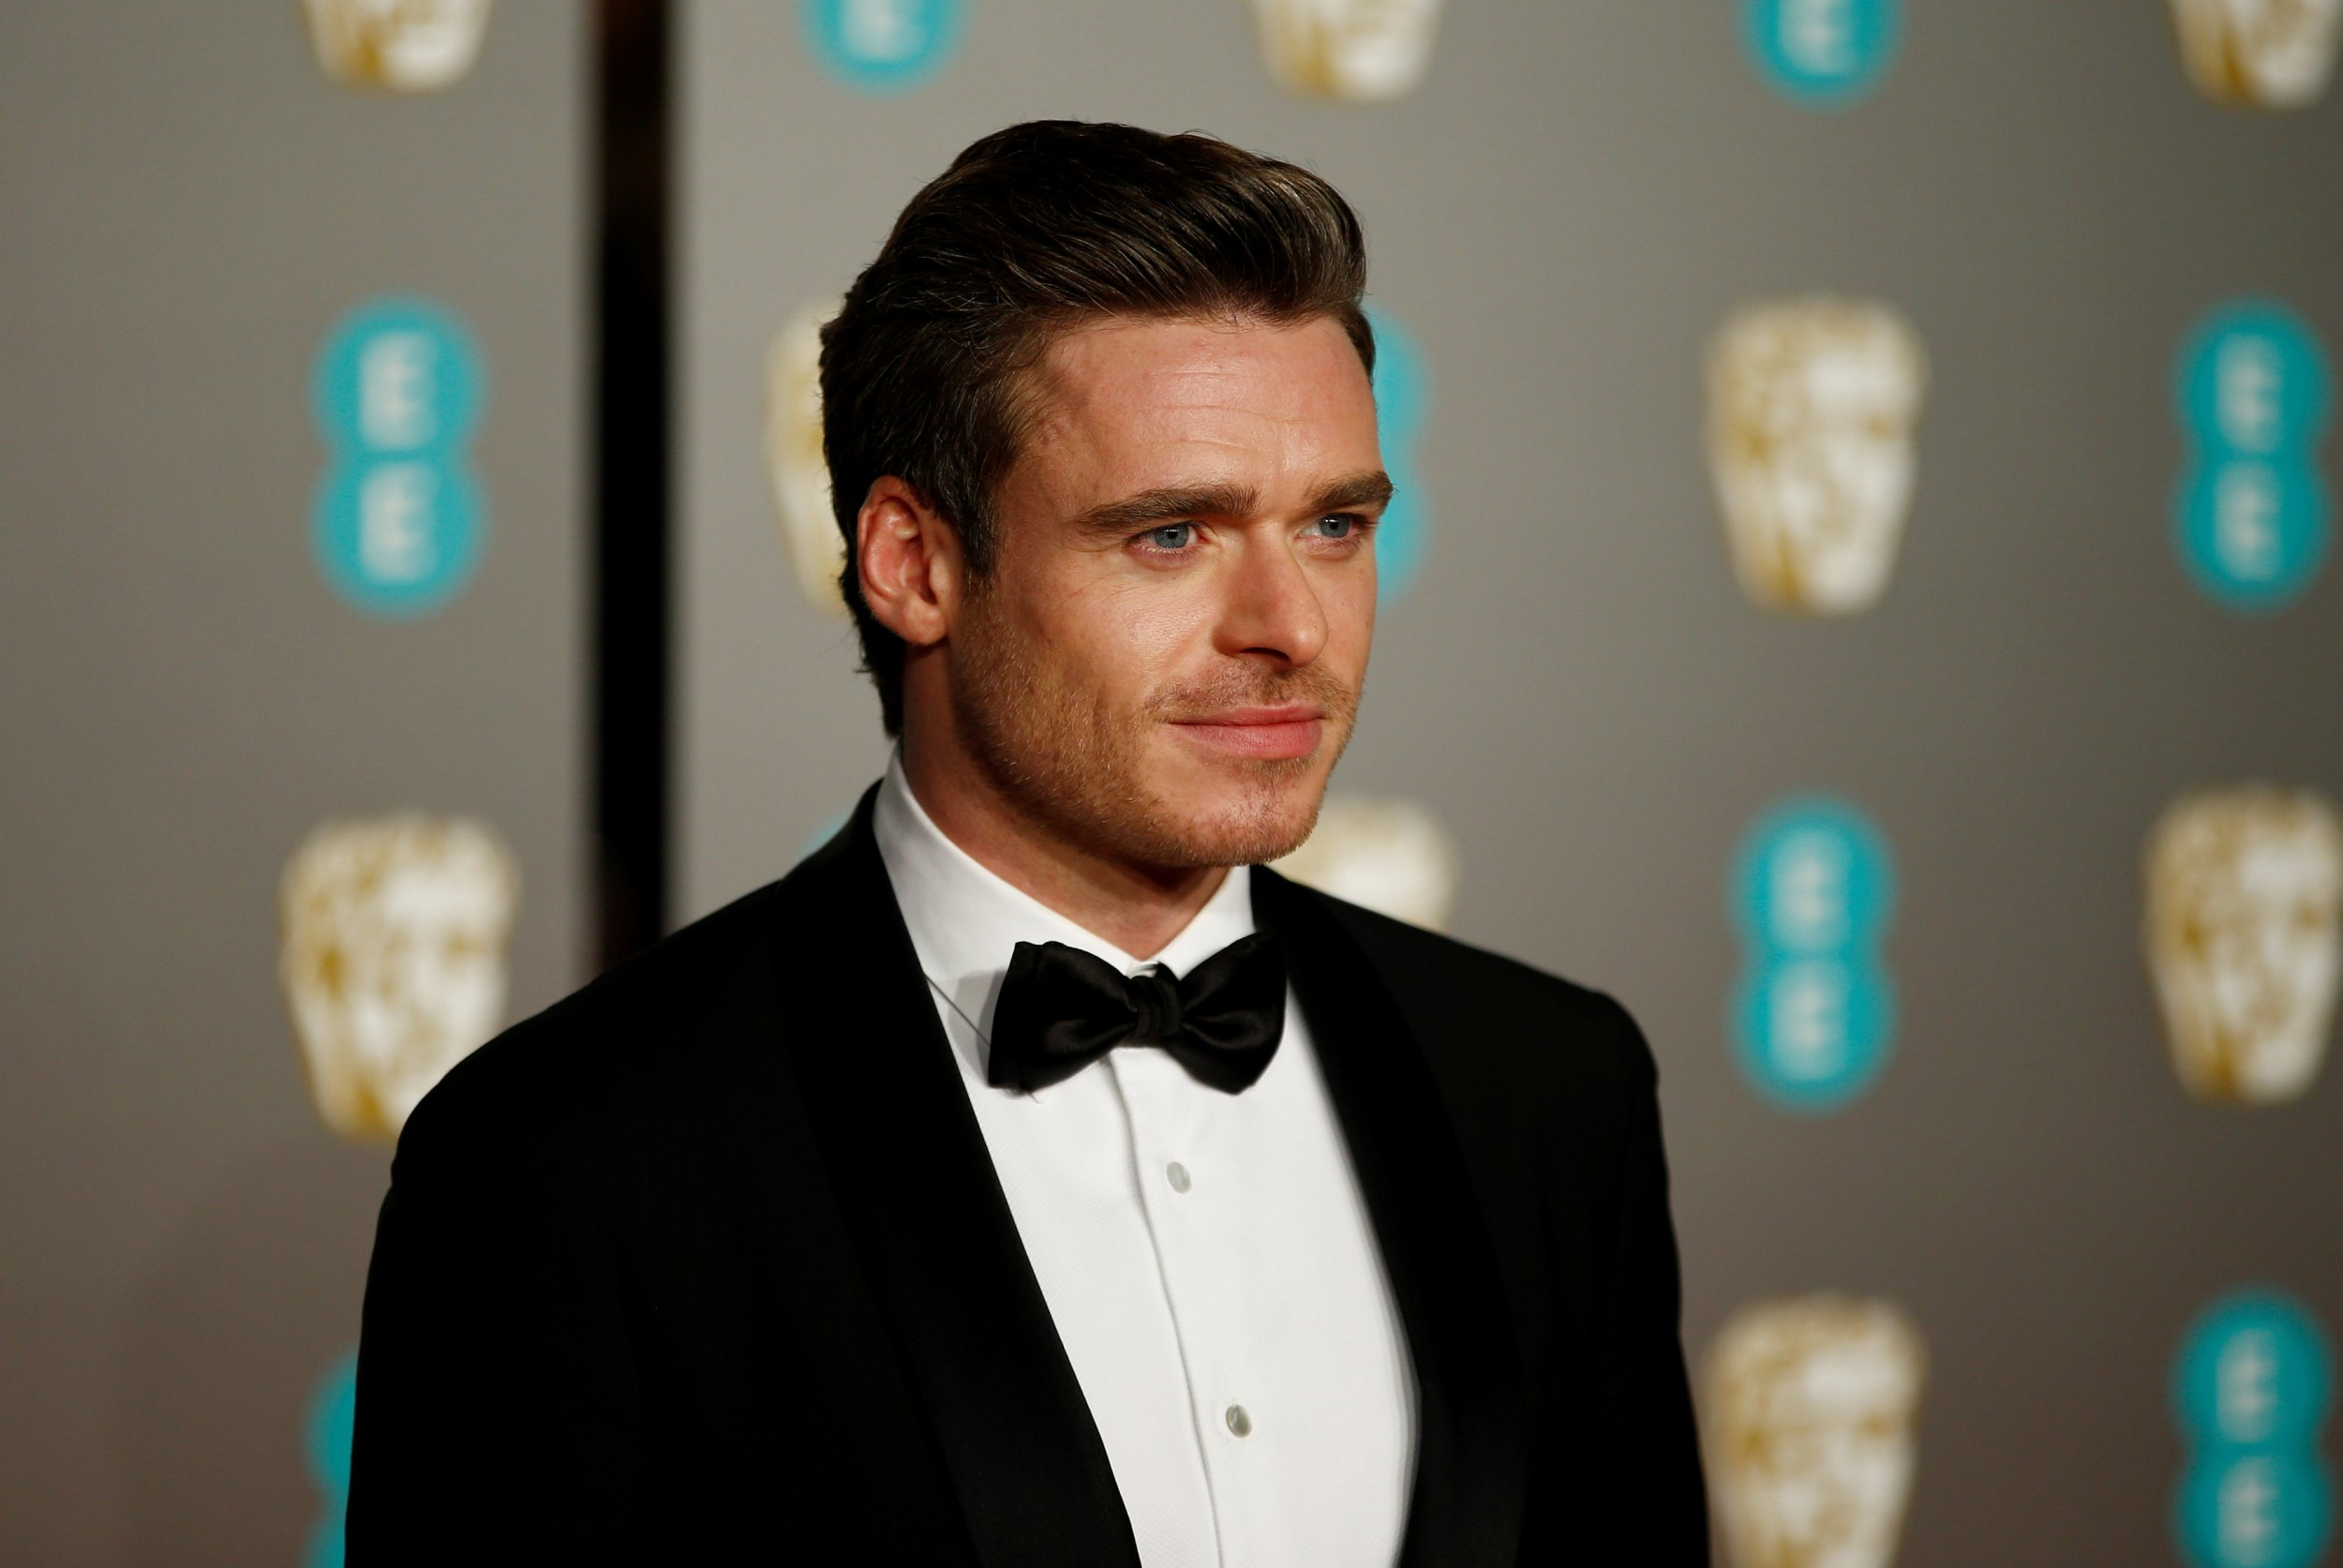 James Bond favourite Richard Madden wants to play 'Bond Boy' to female 007